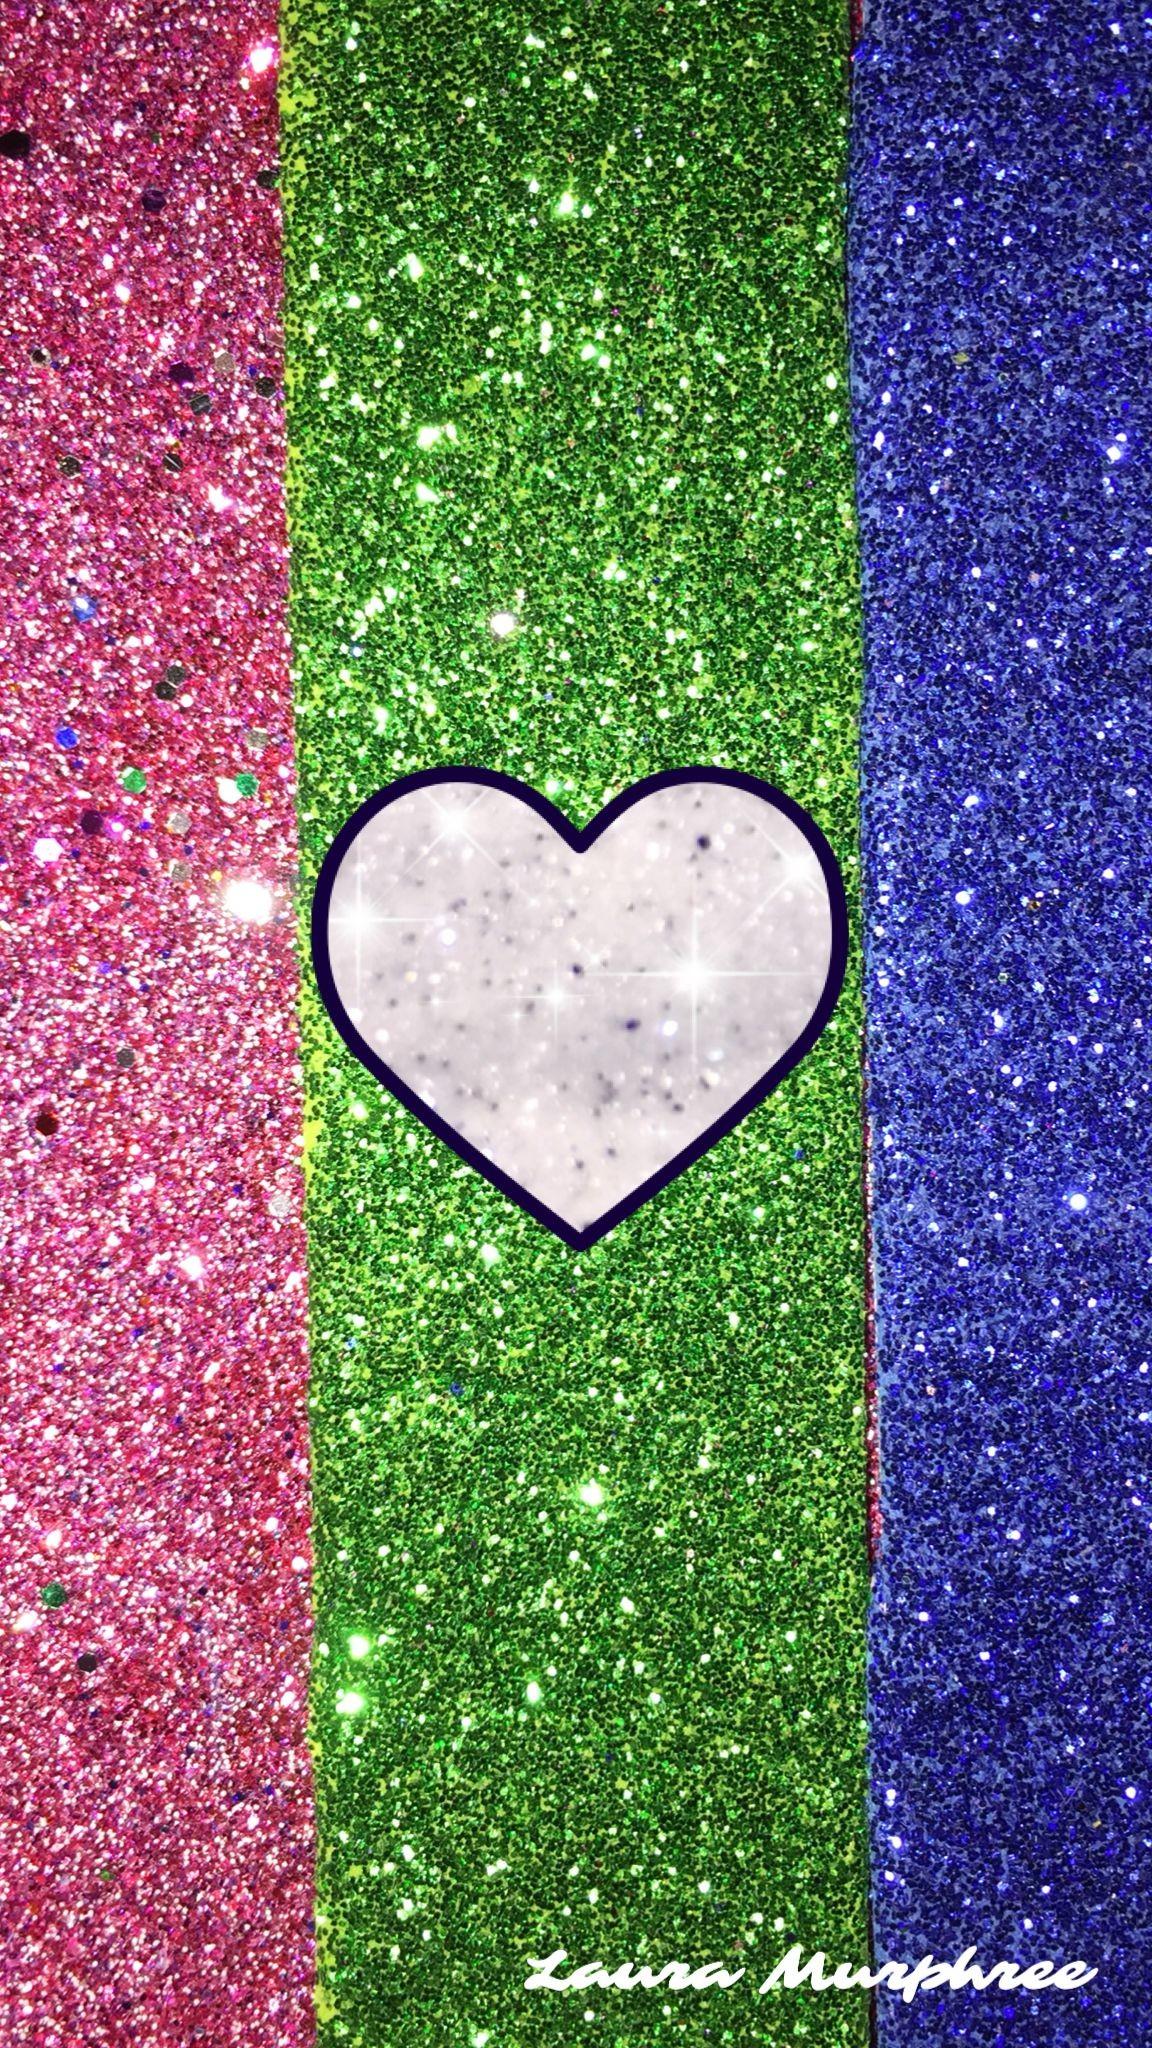 1152x2048, Glitter Heart Phone Wallpaper Sparkle Backgrounds - Beautiful Wallpaper Glitter Heart - HD Wallpaper